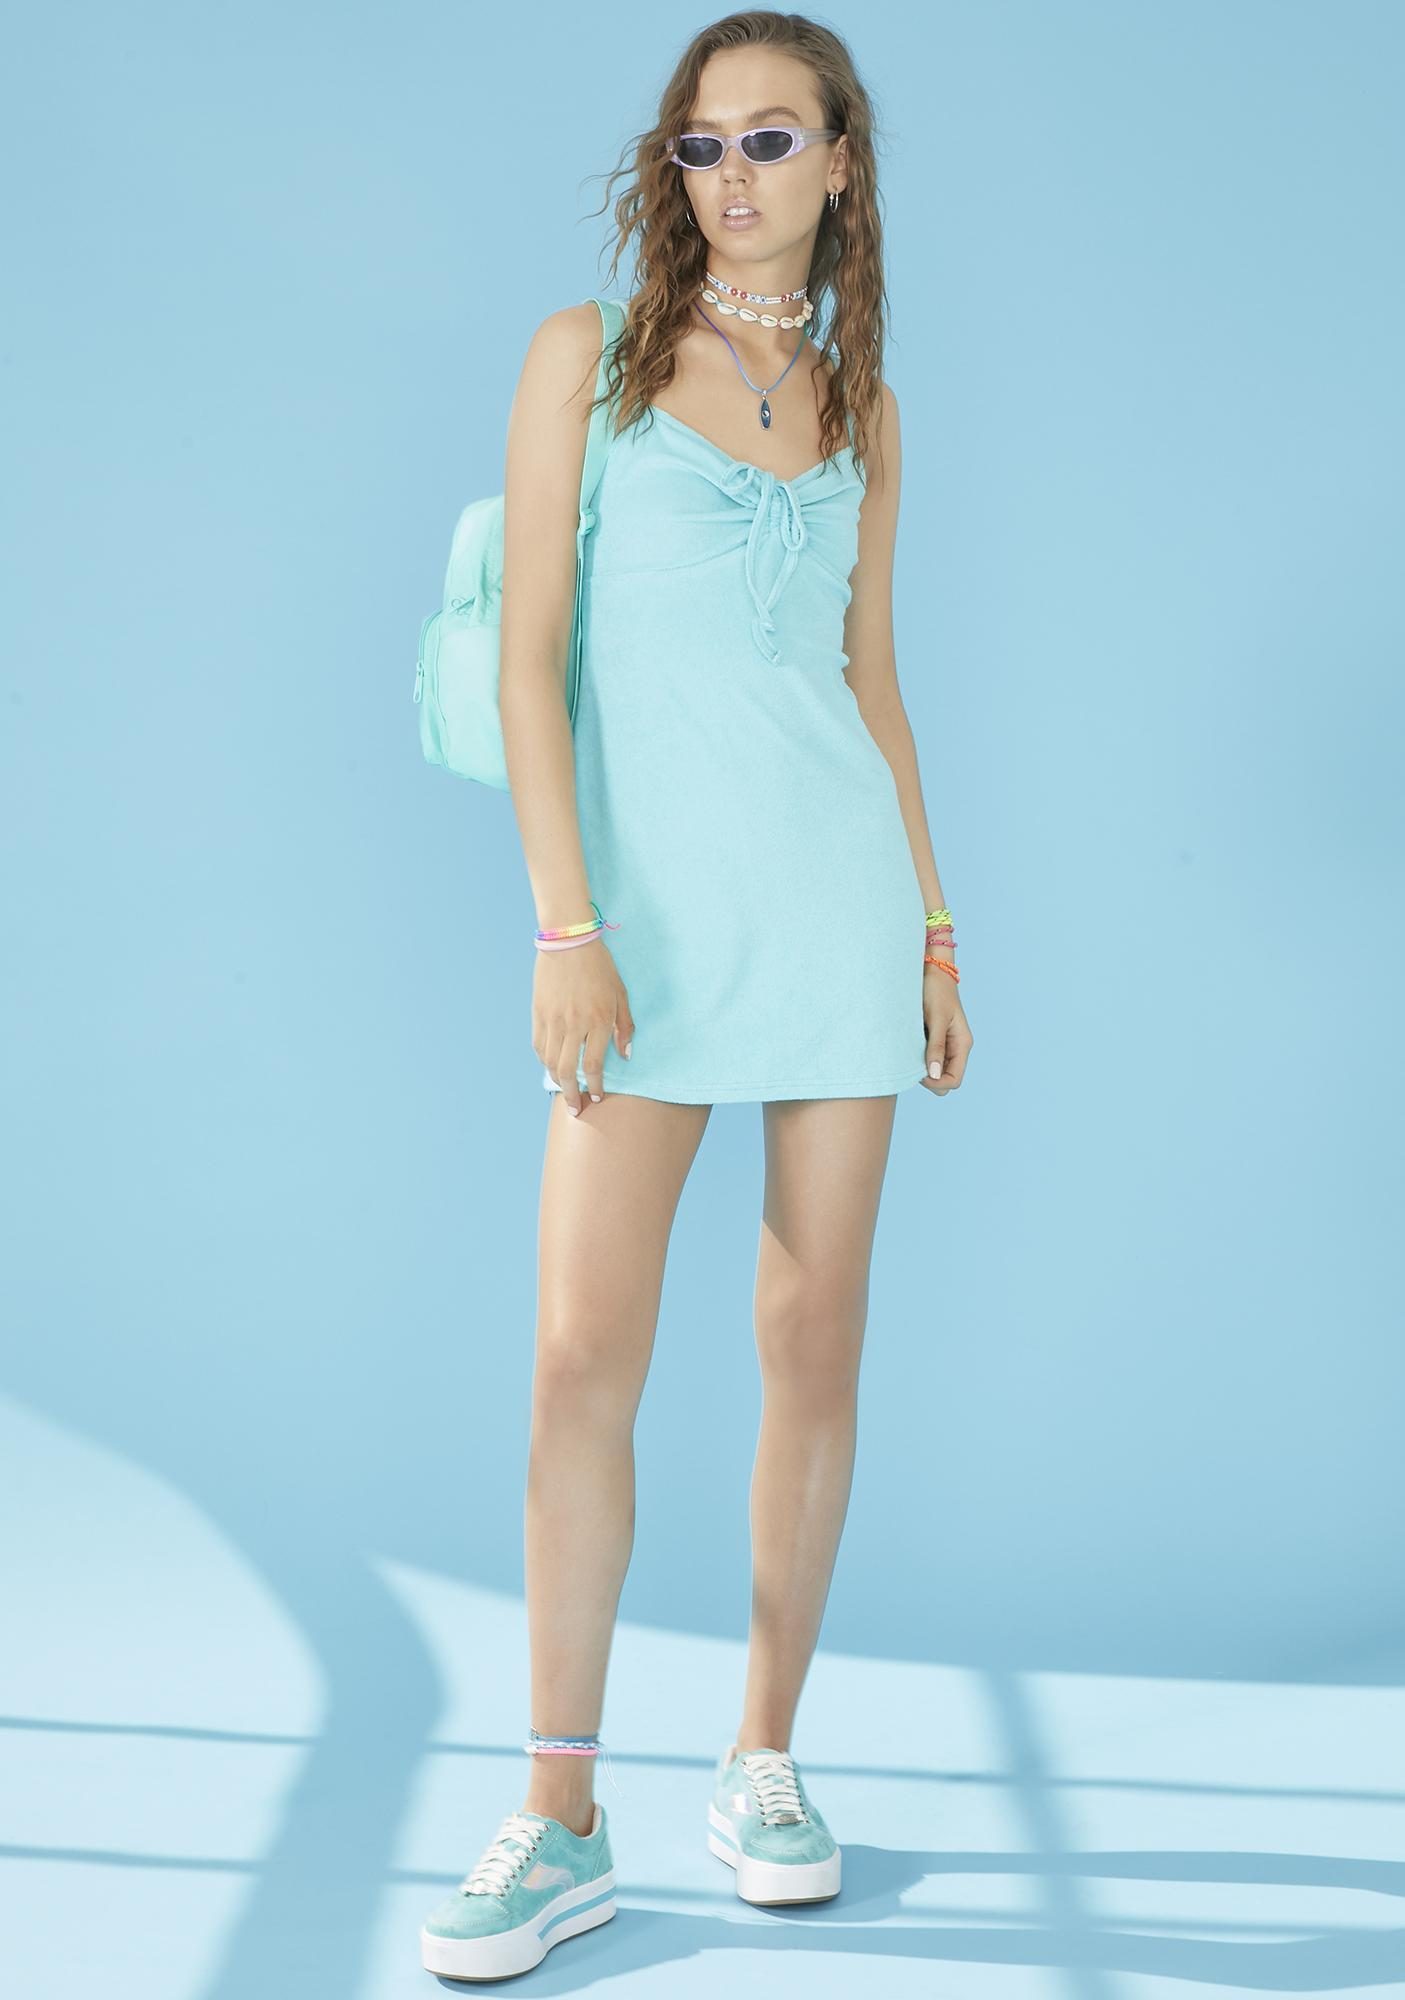 dELiA*s by Dolls Kill Just Add Water Terry Cloth Dress